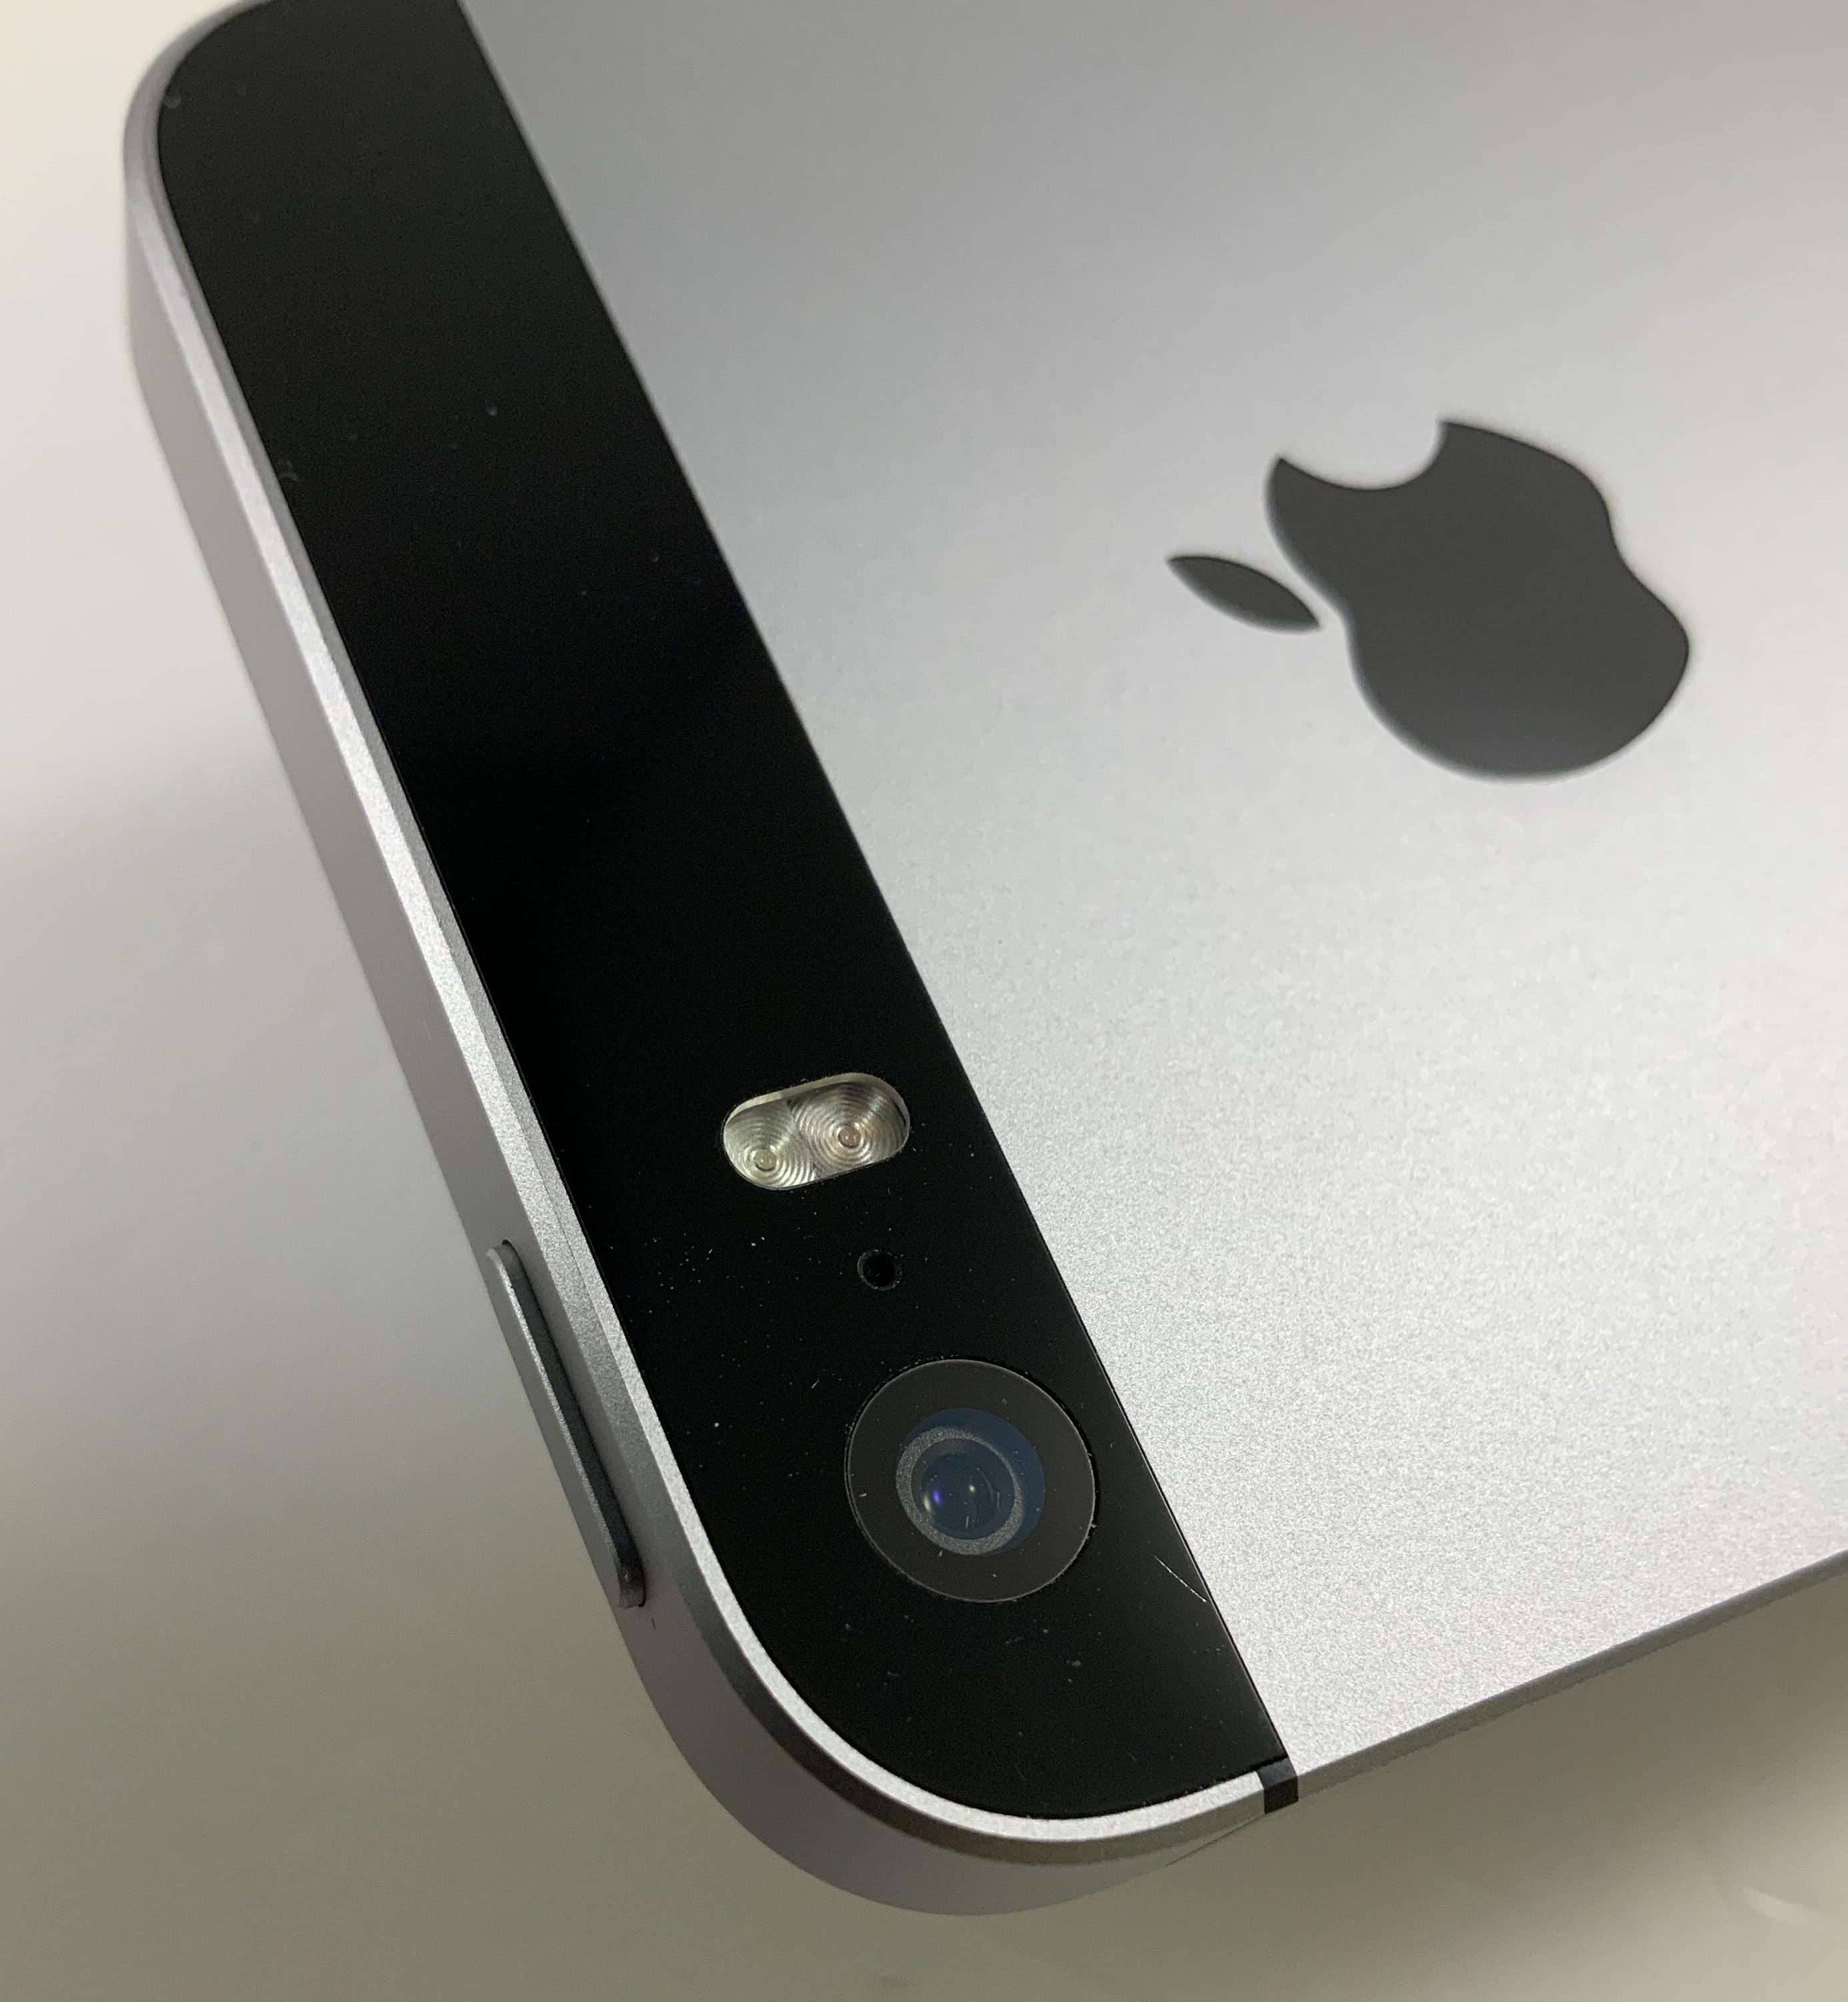 iPhone SE 32GB, 32GB, Space Gray, bild 4